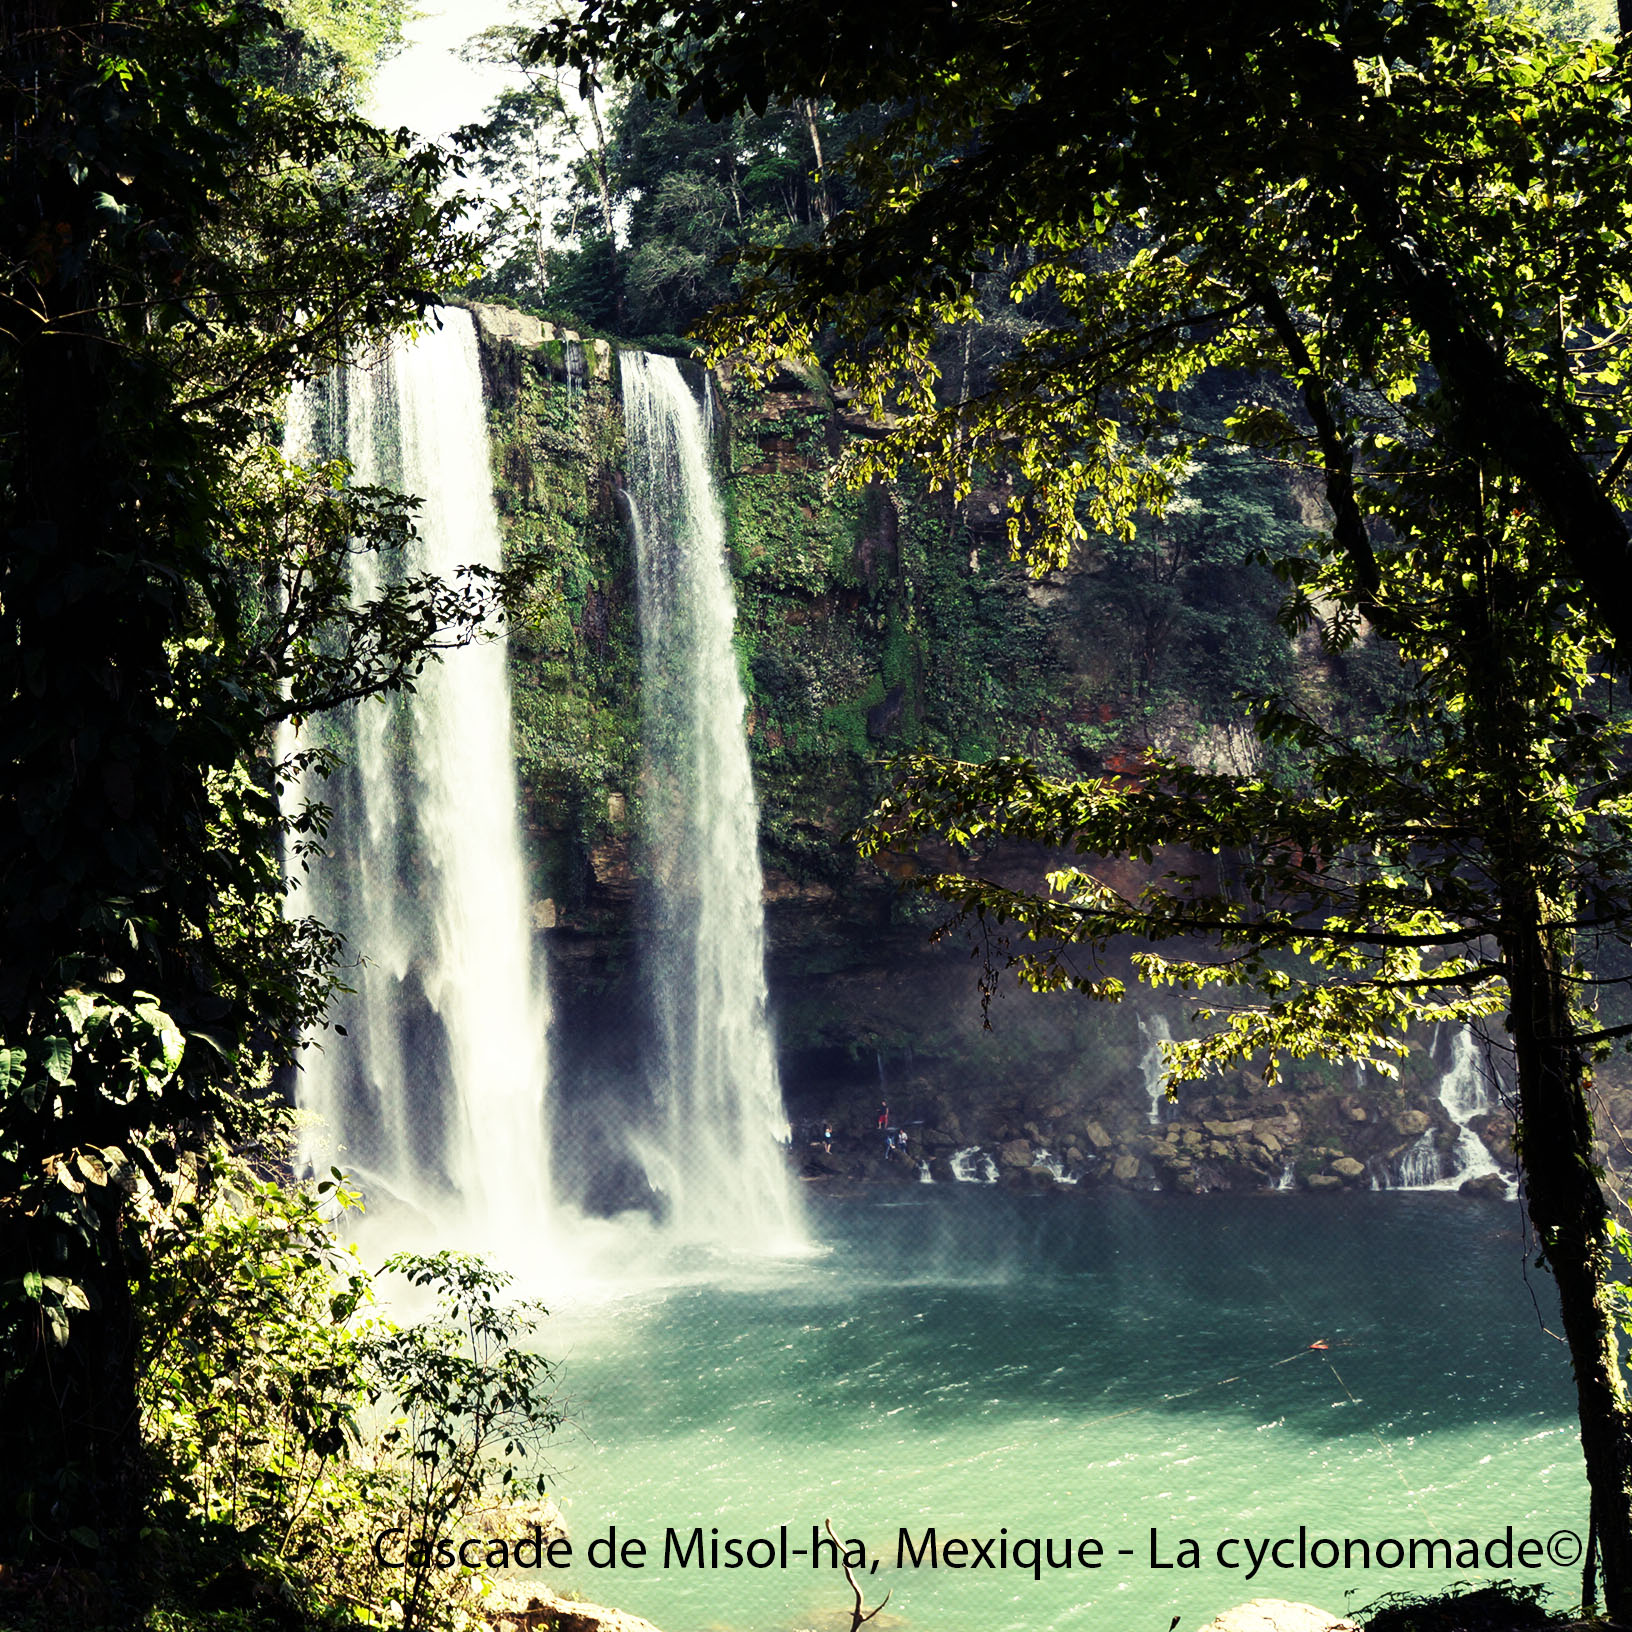 Cascade de Misol-ha